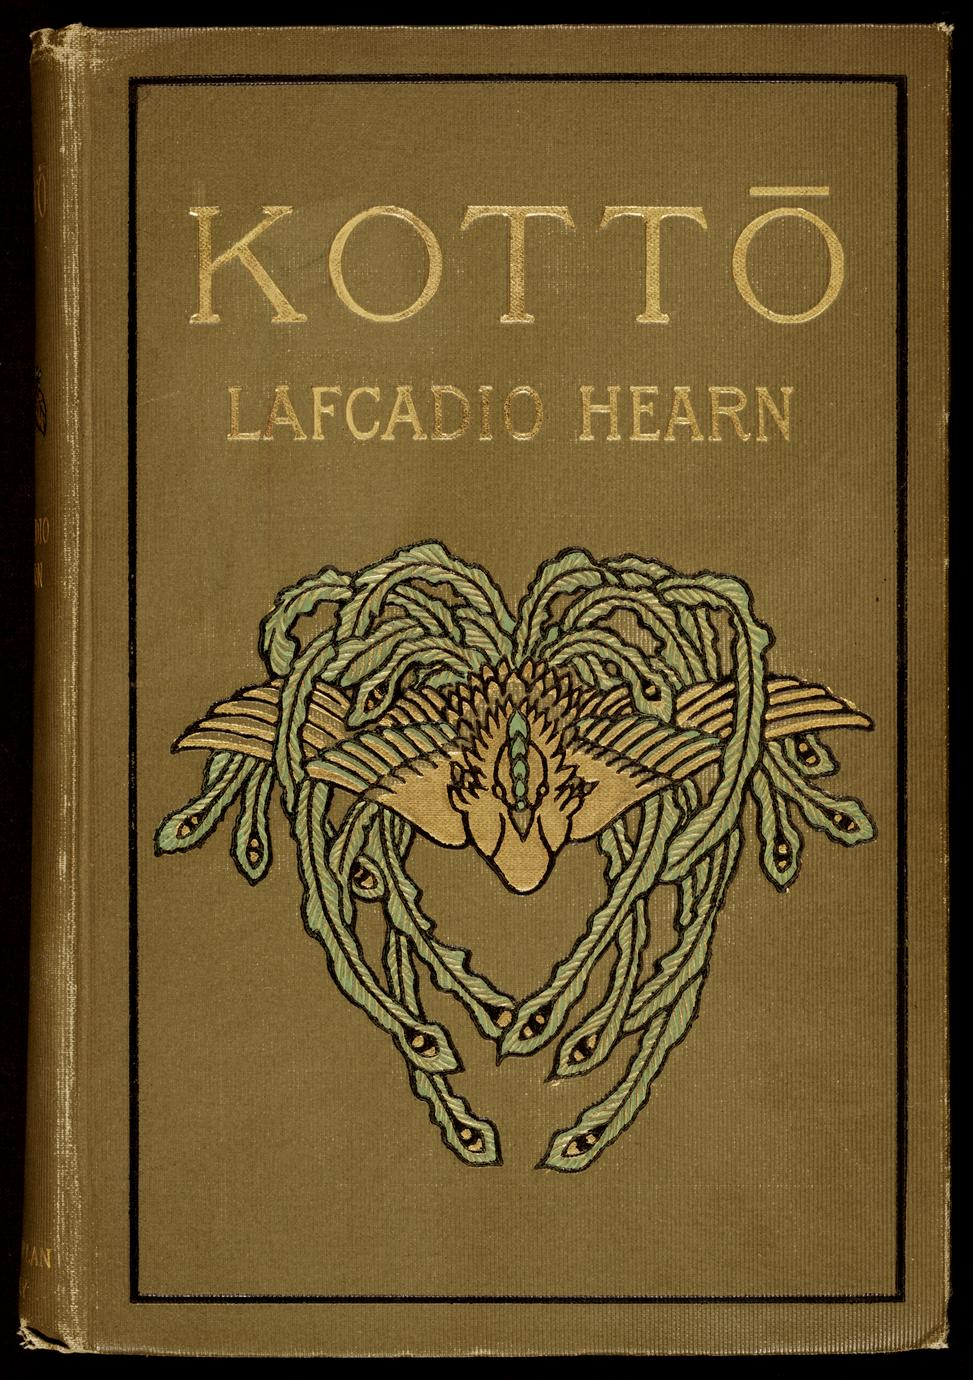 Kottō : being Japanese curios, with sundry cobwebs (1 of 2)